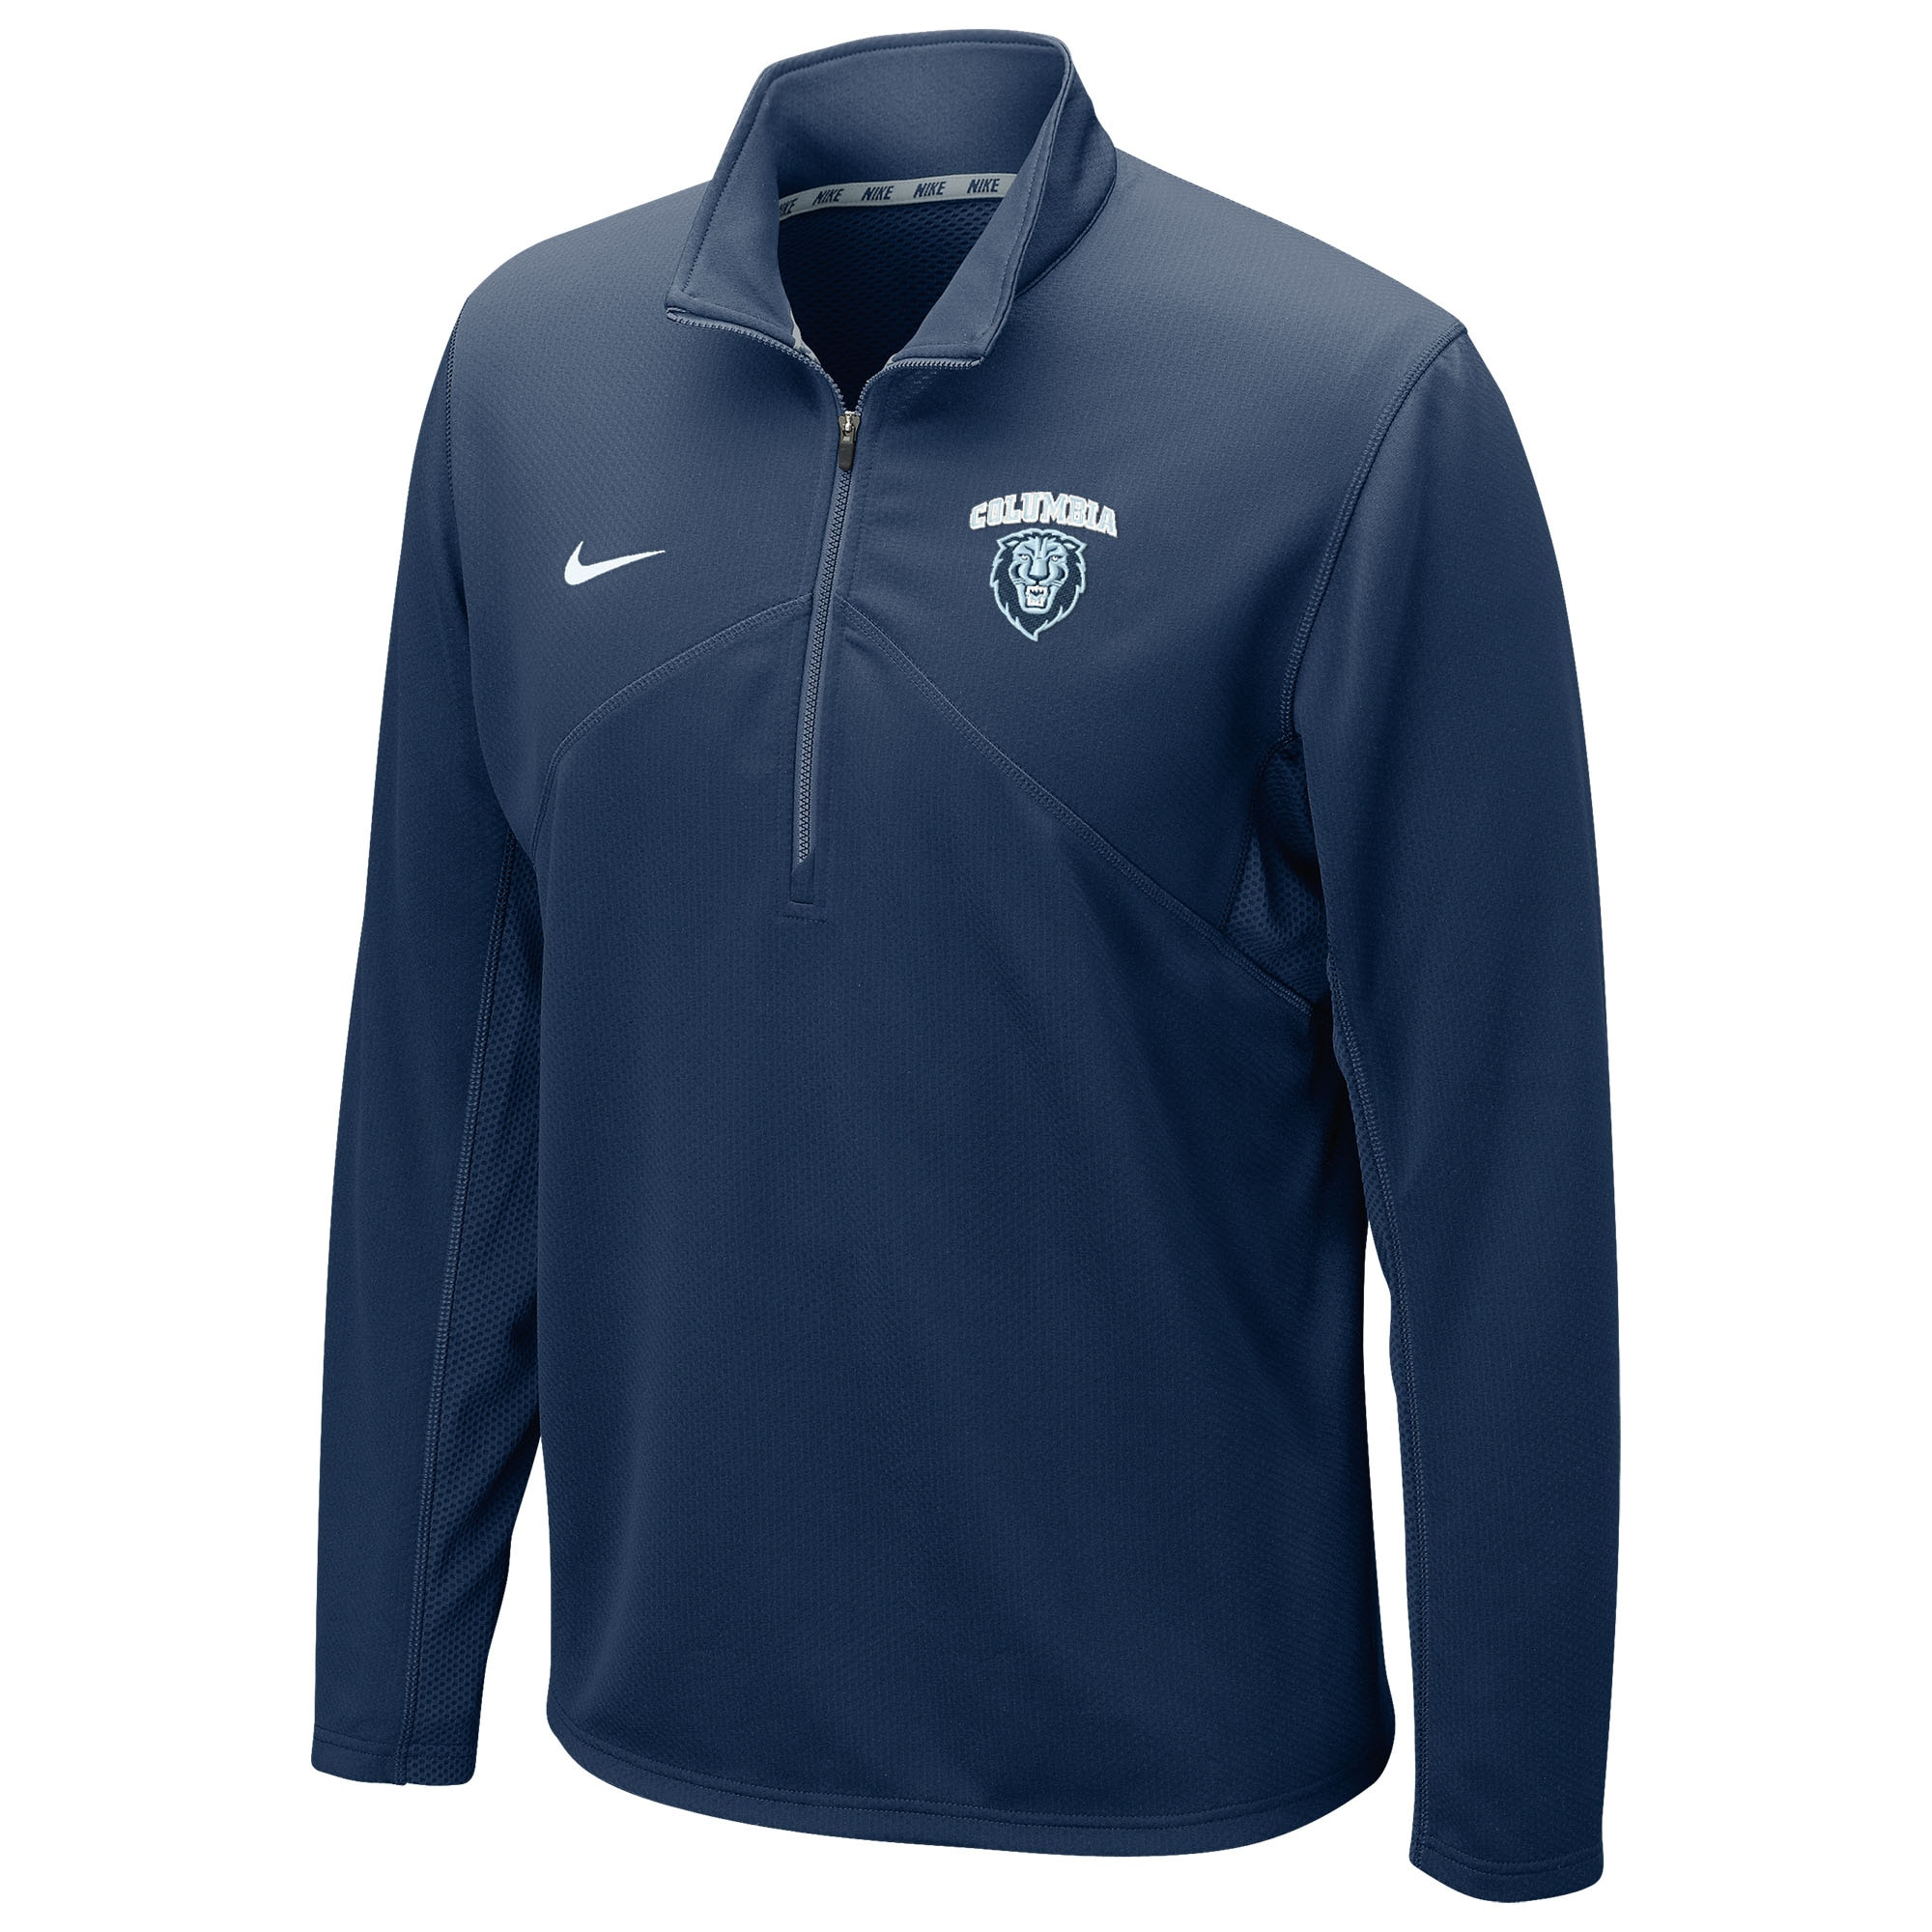 Columbia University Nike Men's DRI-FIT Training Quarter Zip